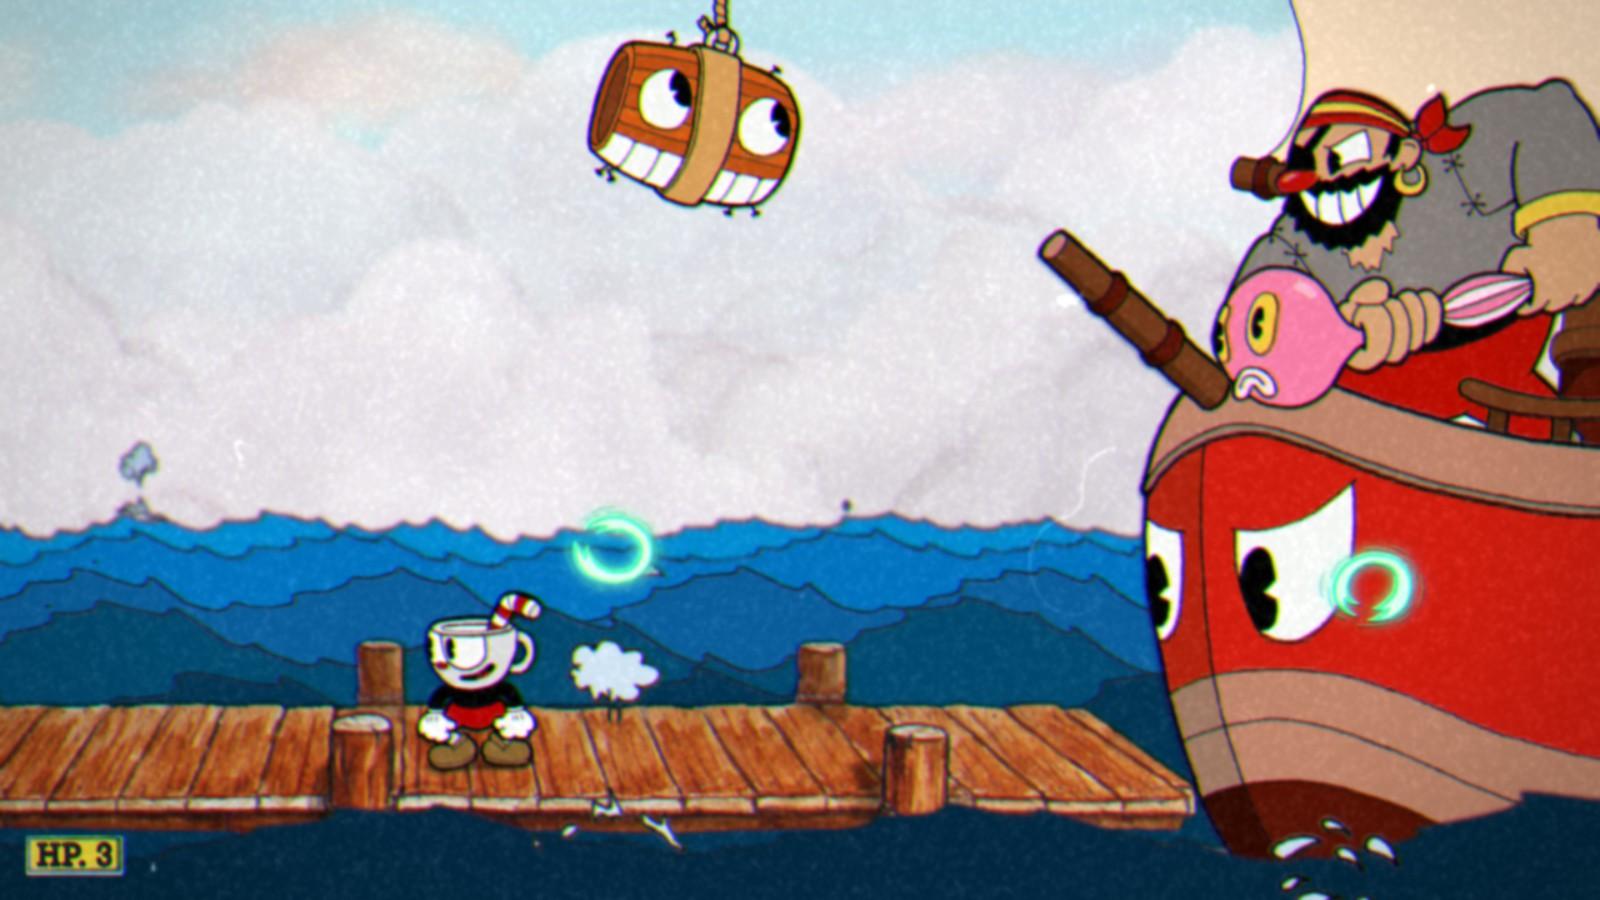 Cuphead Boss Rehberi: Inkwell Adası III 3